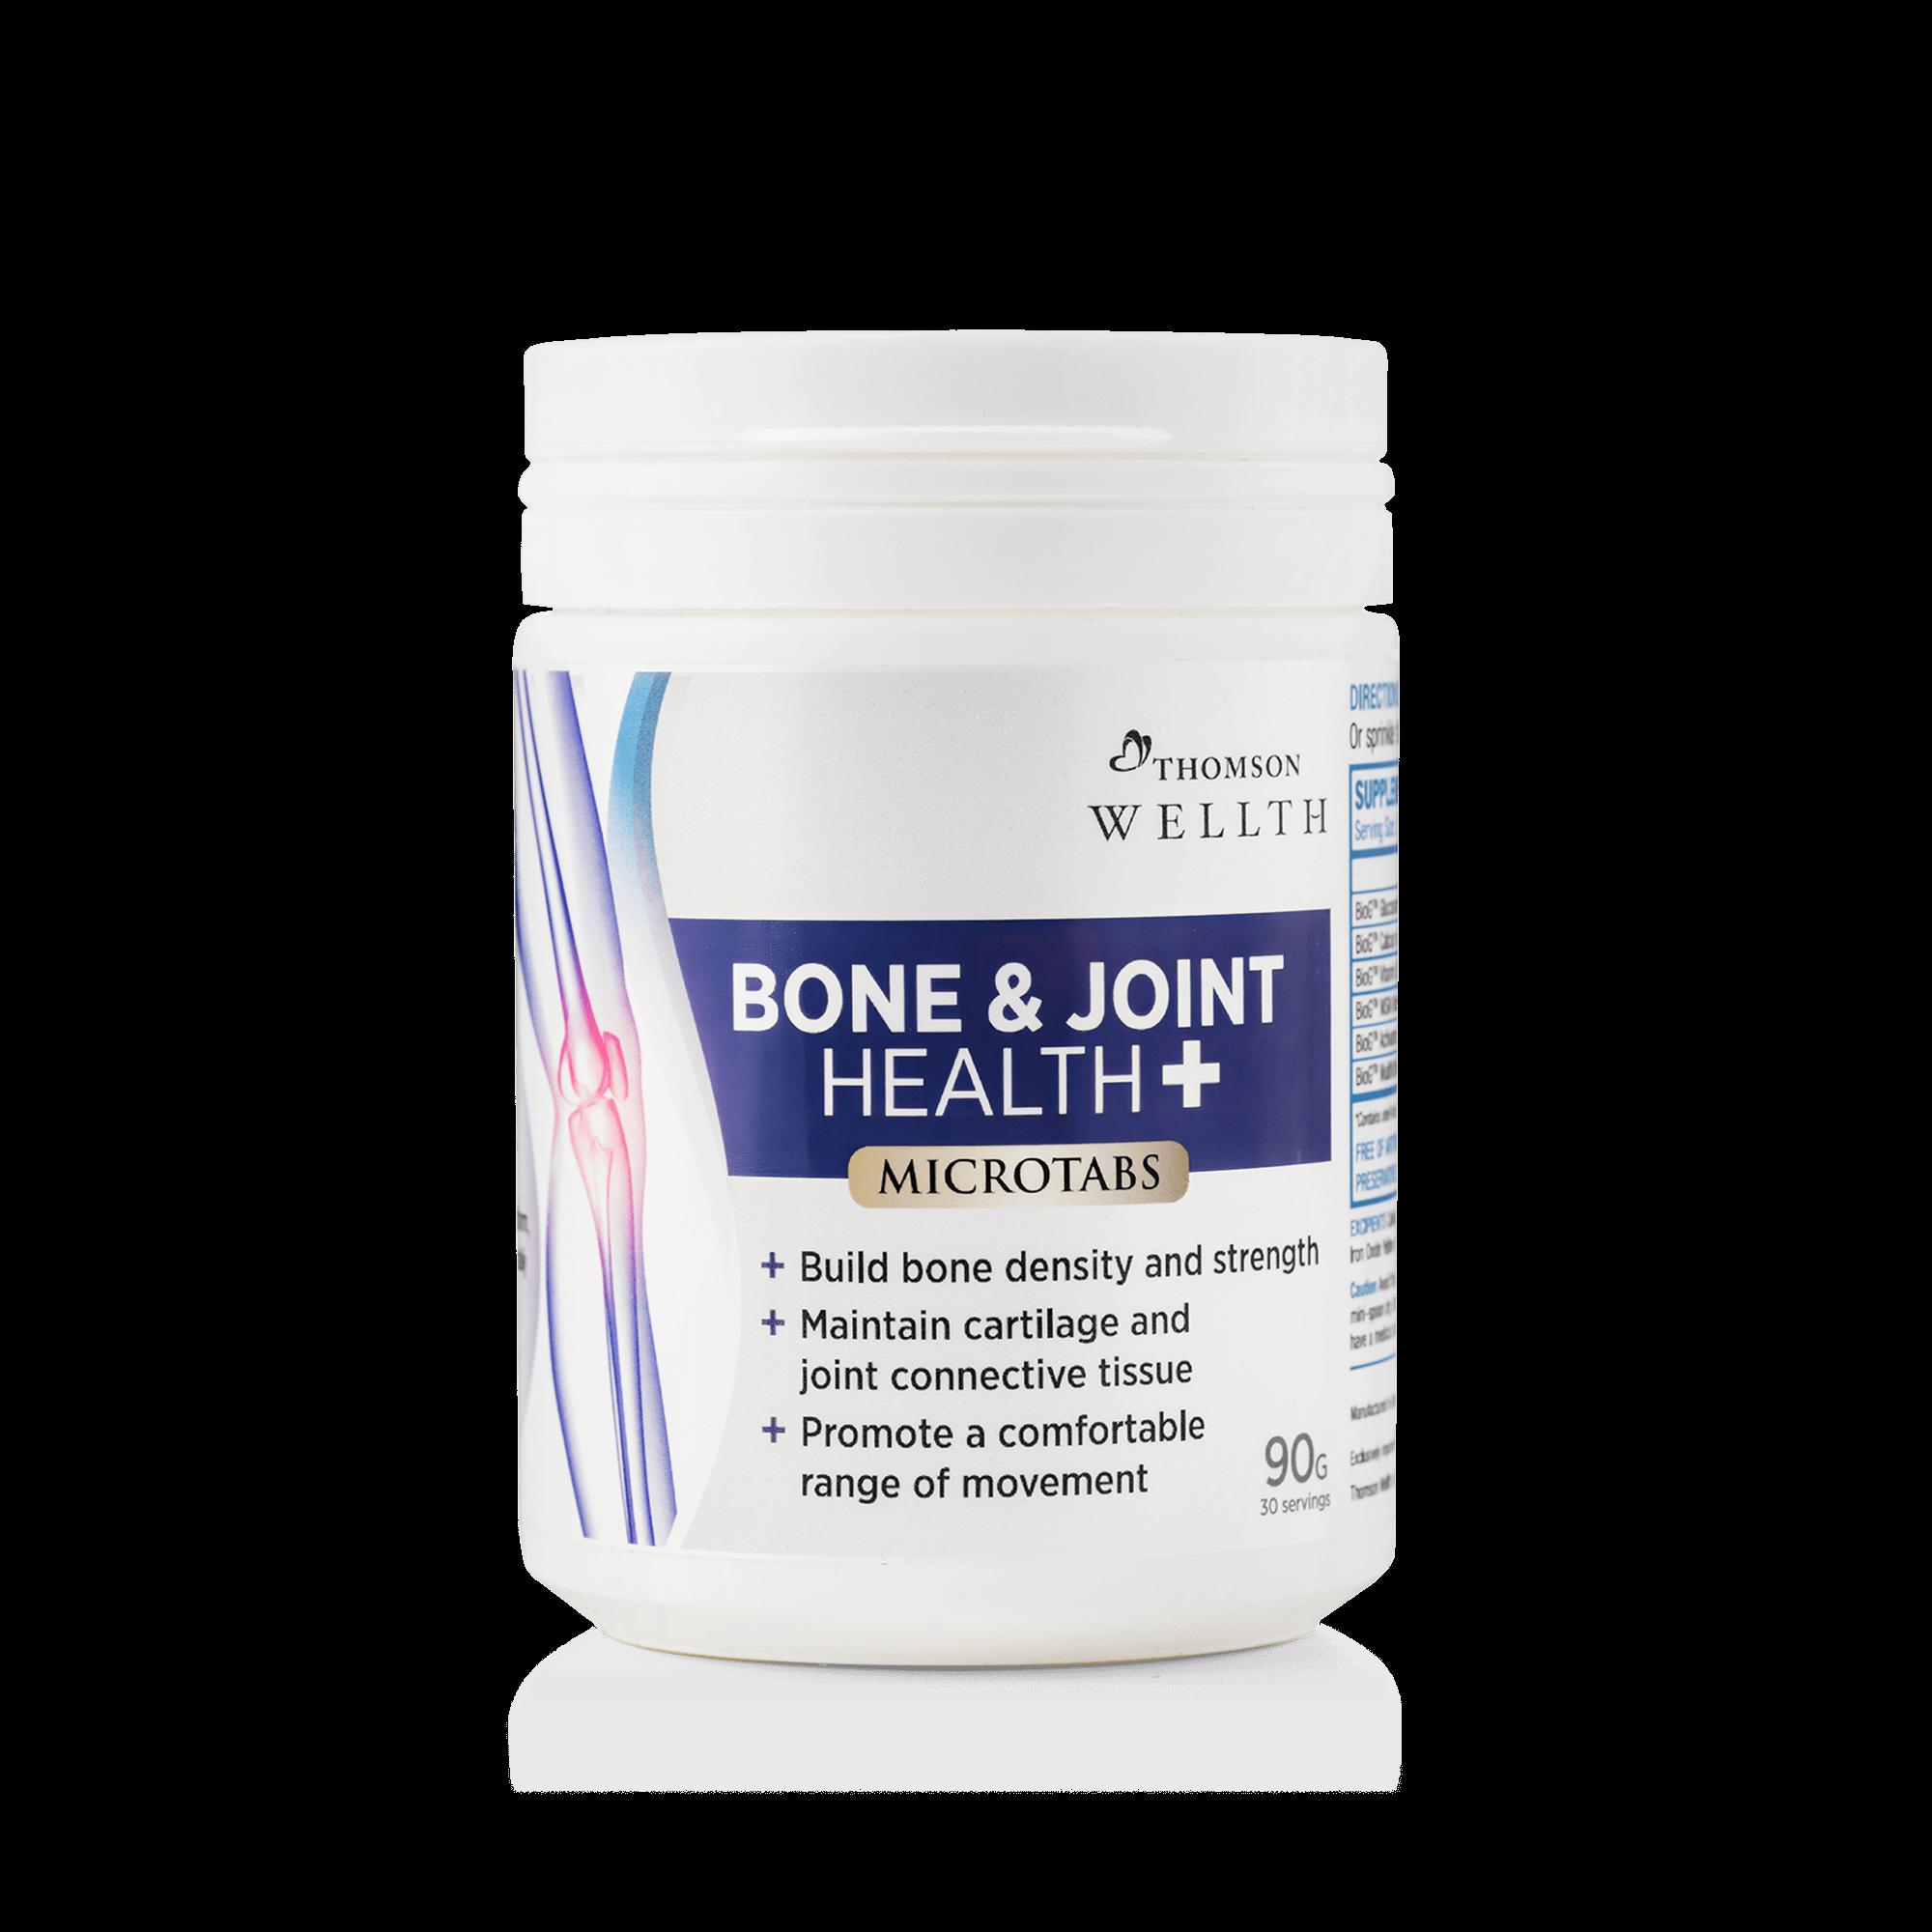 Thomson Wellth Bone & Joint Health Supplement